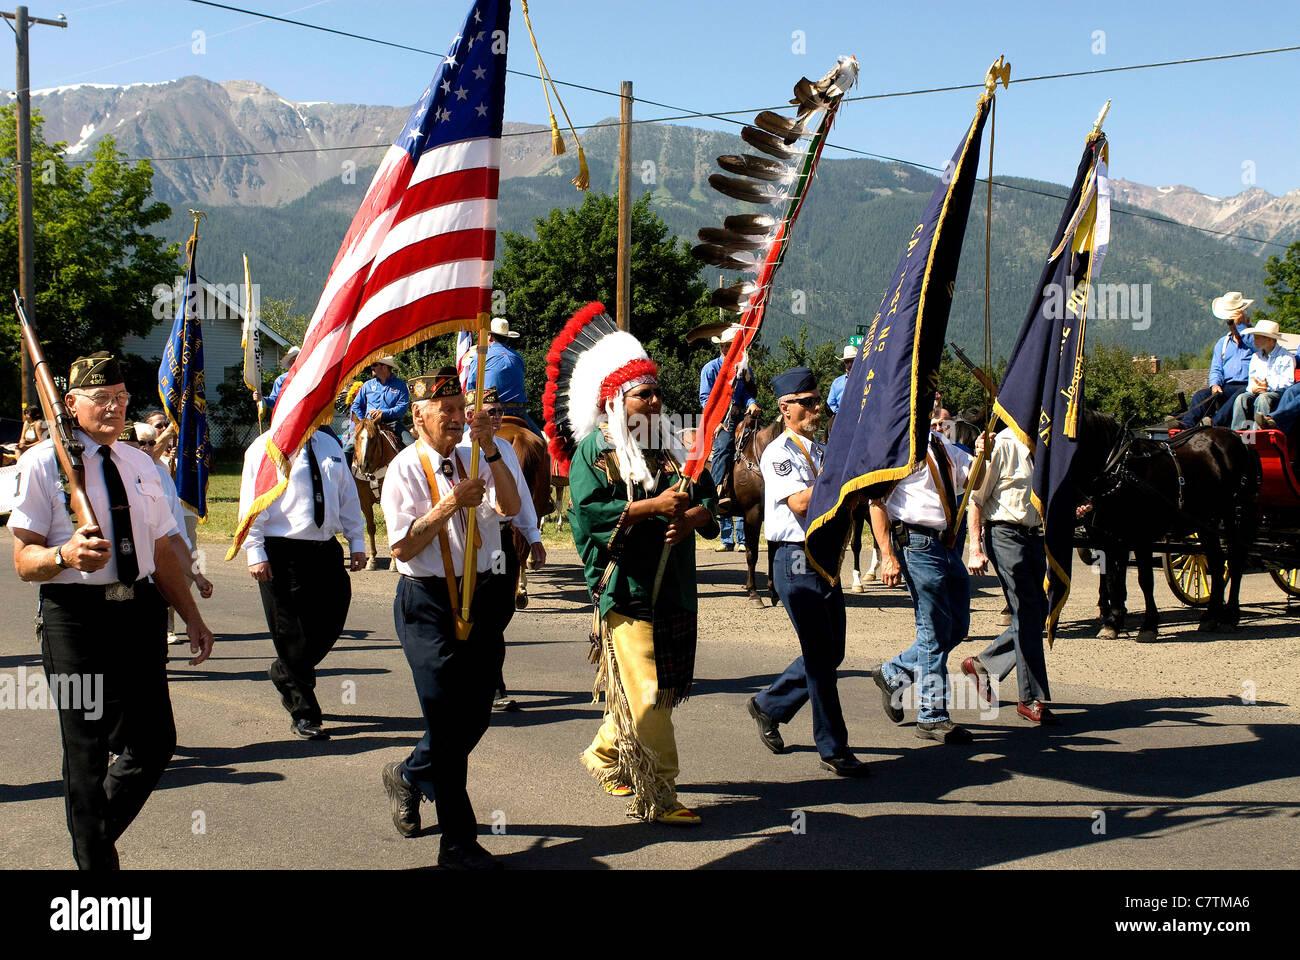 Parade through Main Street of Joseph, Eastern Oregon, during Chief Joseph Days celebrations of historic Indian Nez - Stock Image